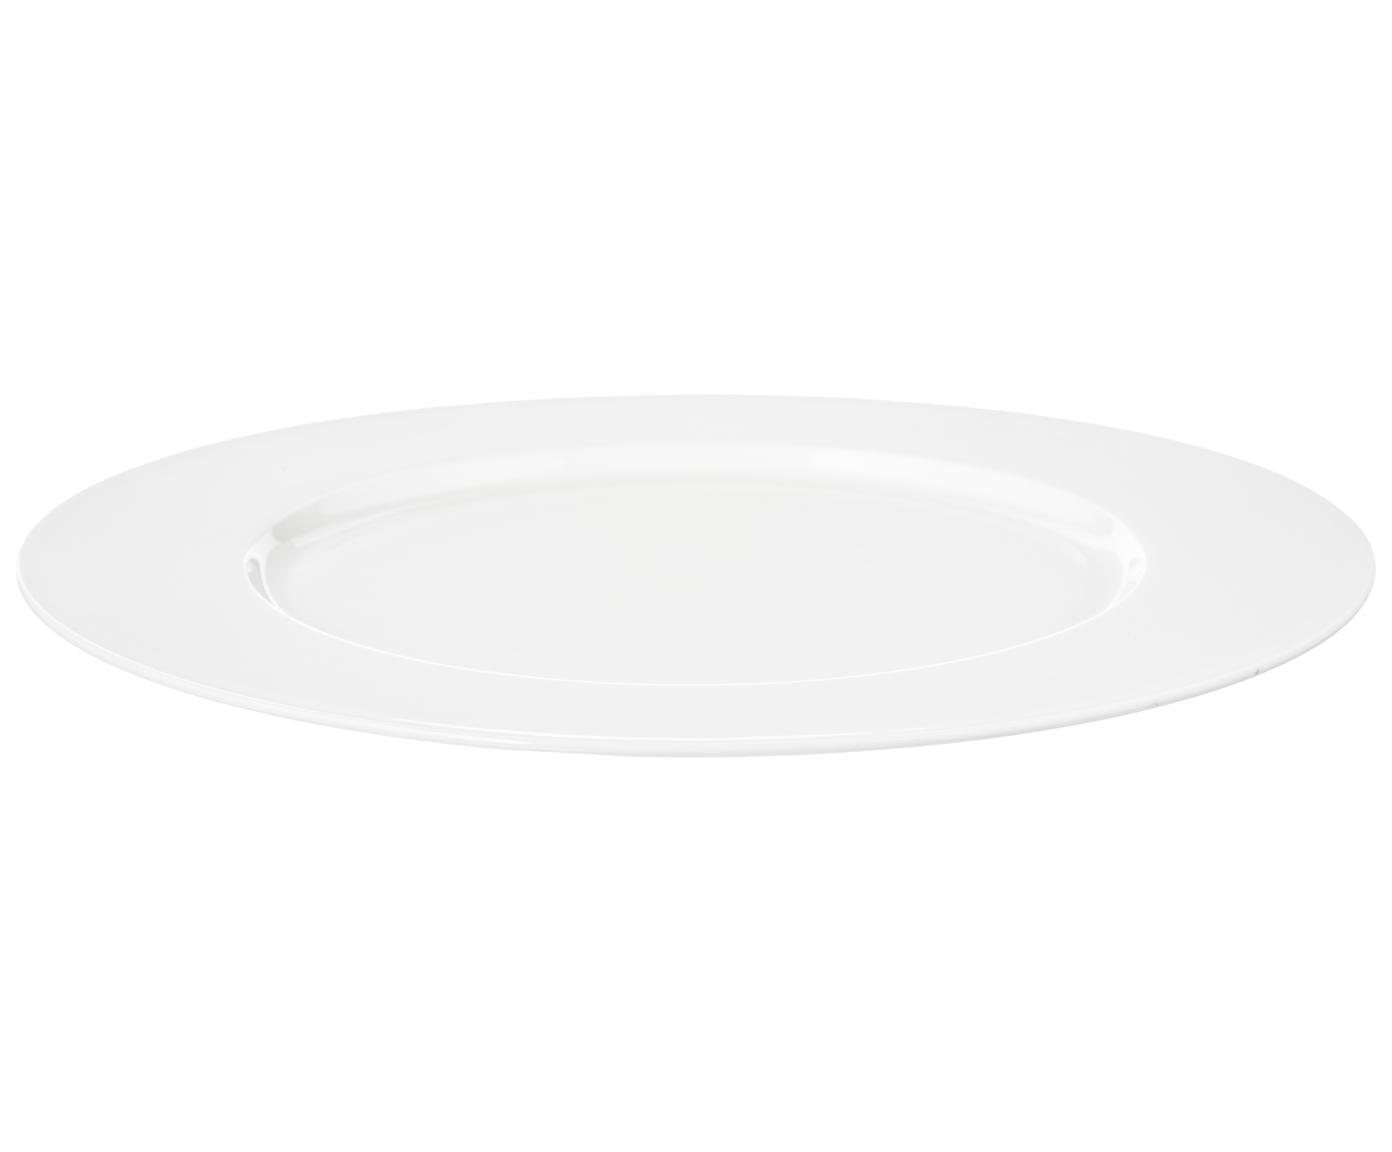 Bajoplato de porcelana Á Table, Porcelana fina, Blanco, Ø 32 cm